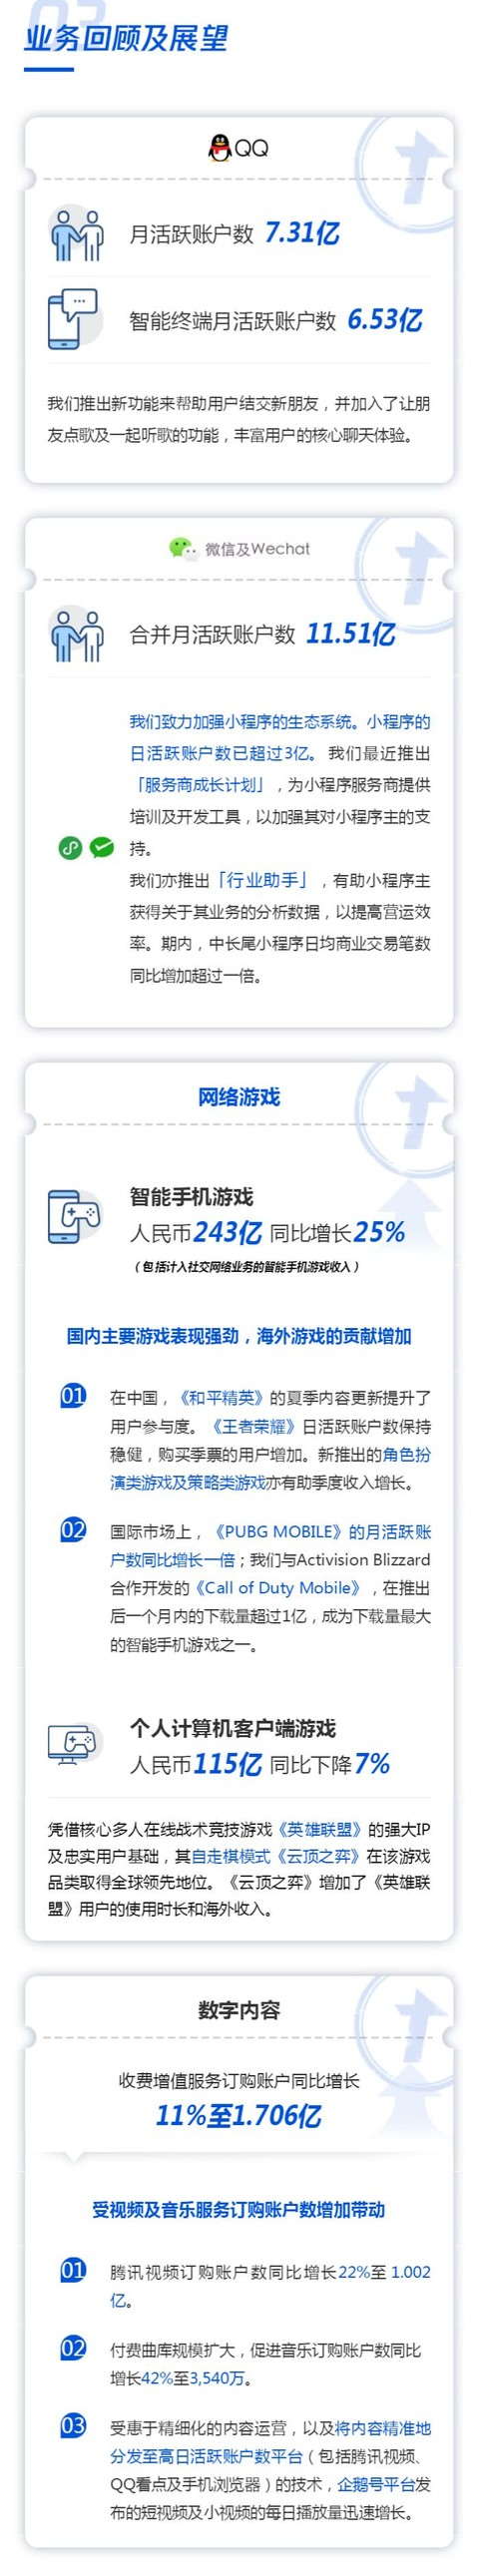 am8.com亚美开户平台 - 《春江水暖》获金鸡双提名,国内外颁奖季两开花